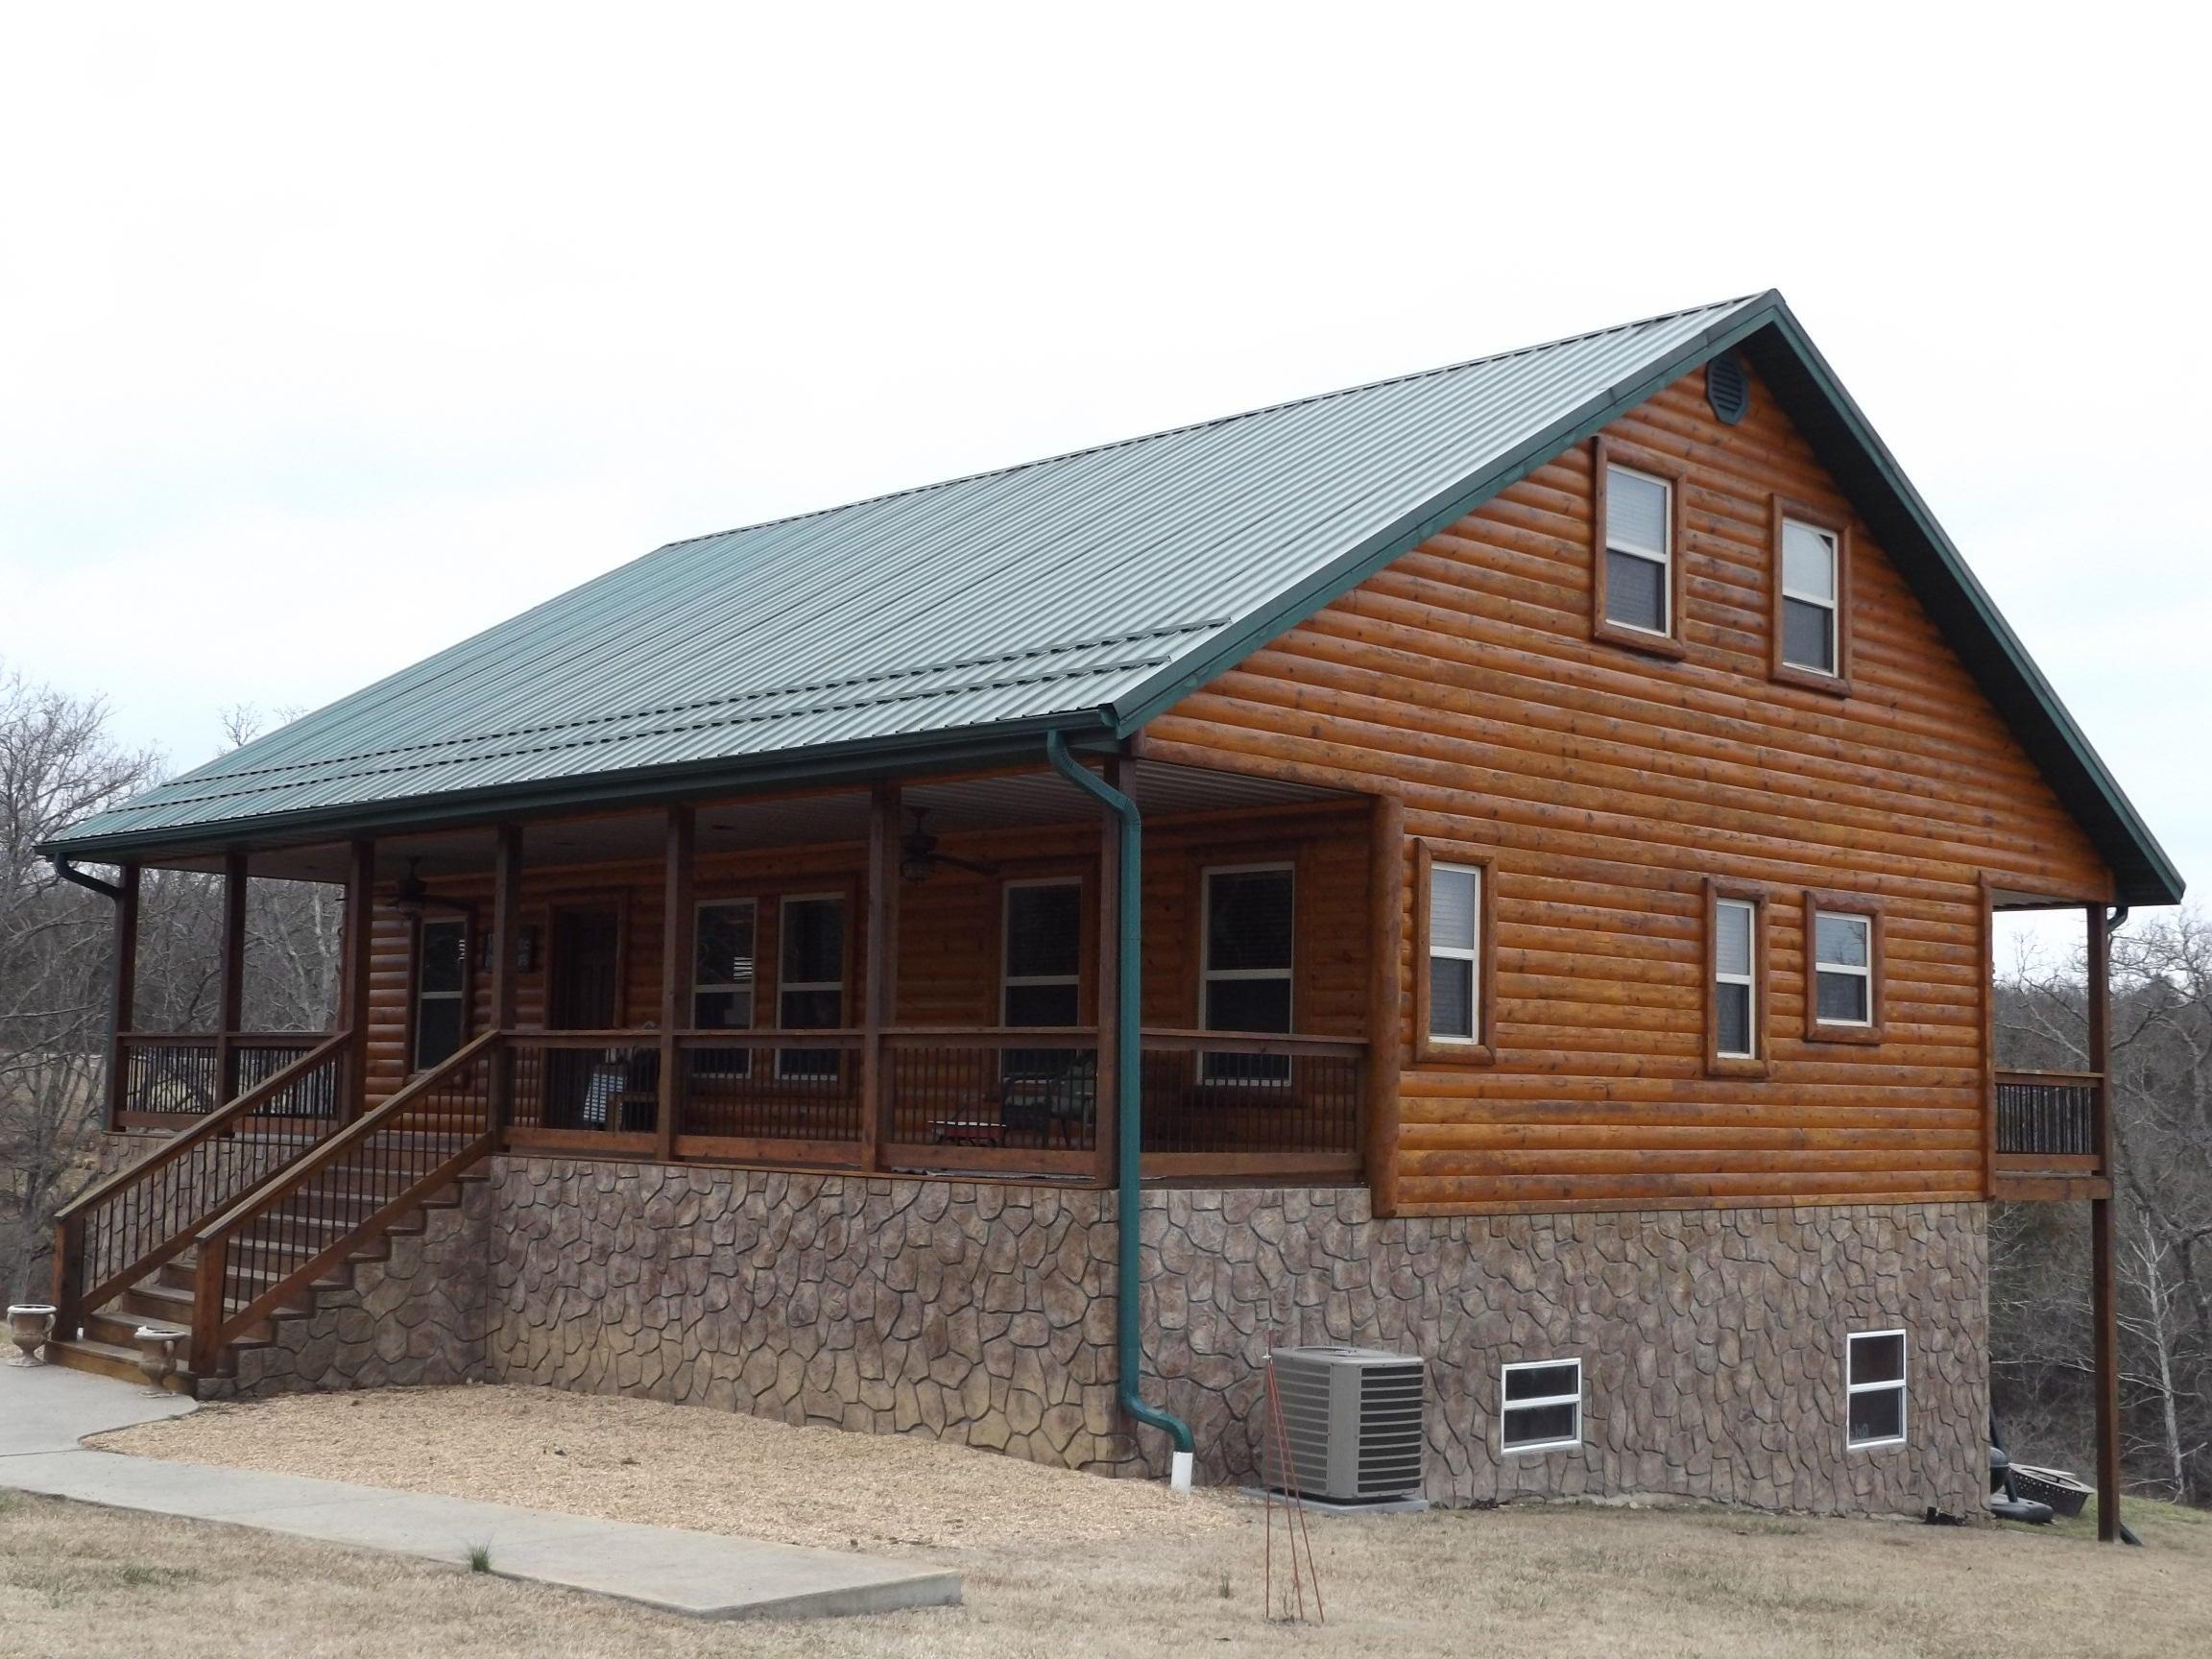 132  State Hwy Oo Cedar Creek, MO 65627